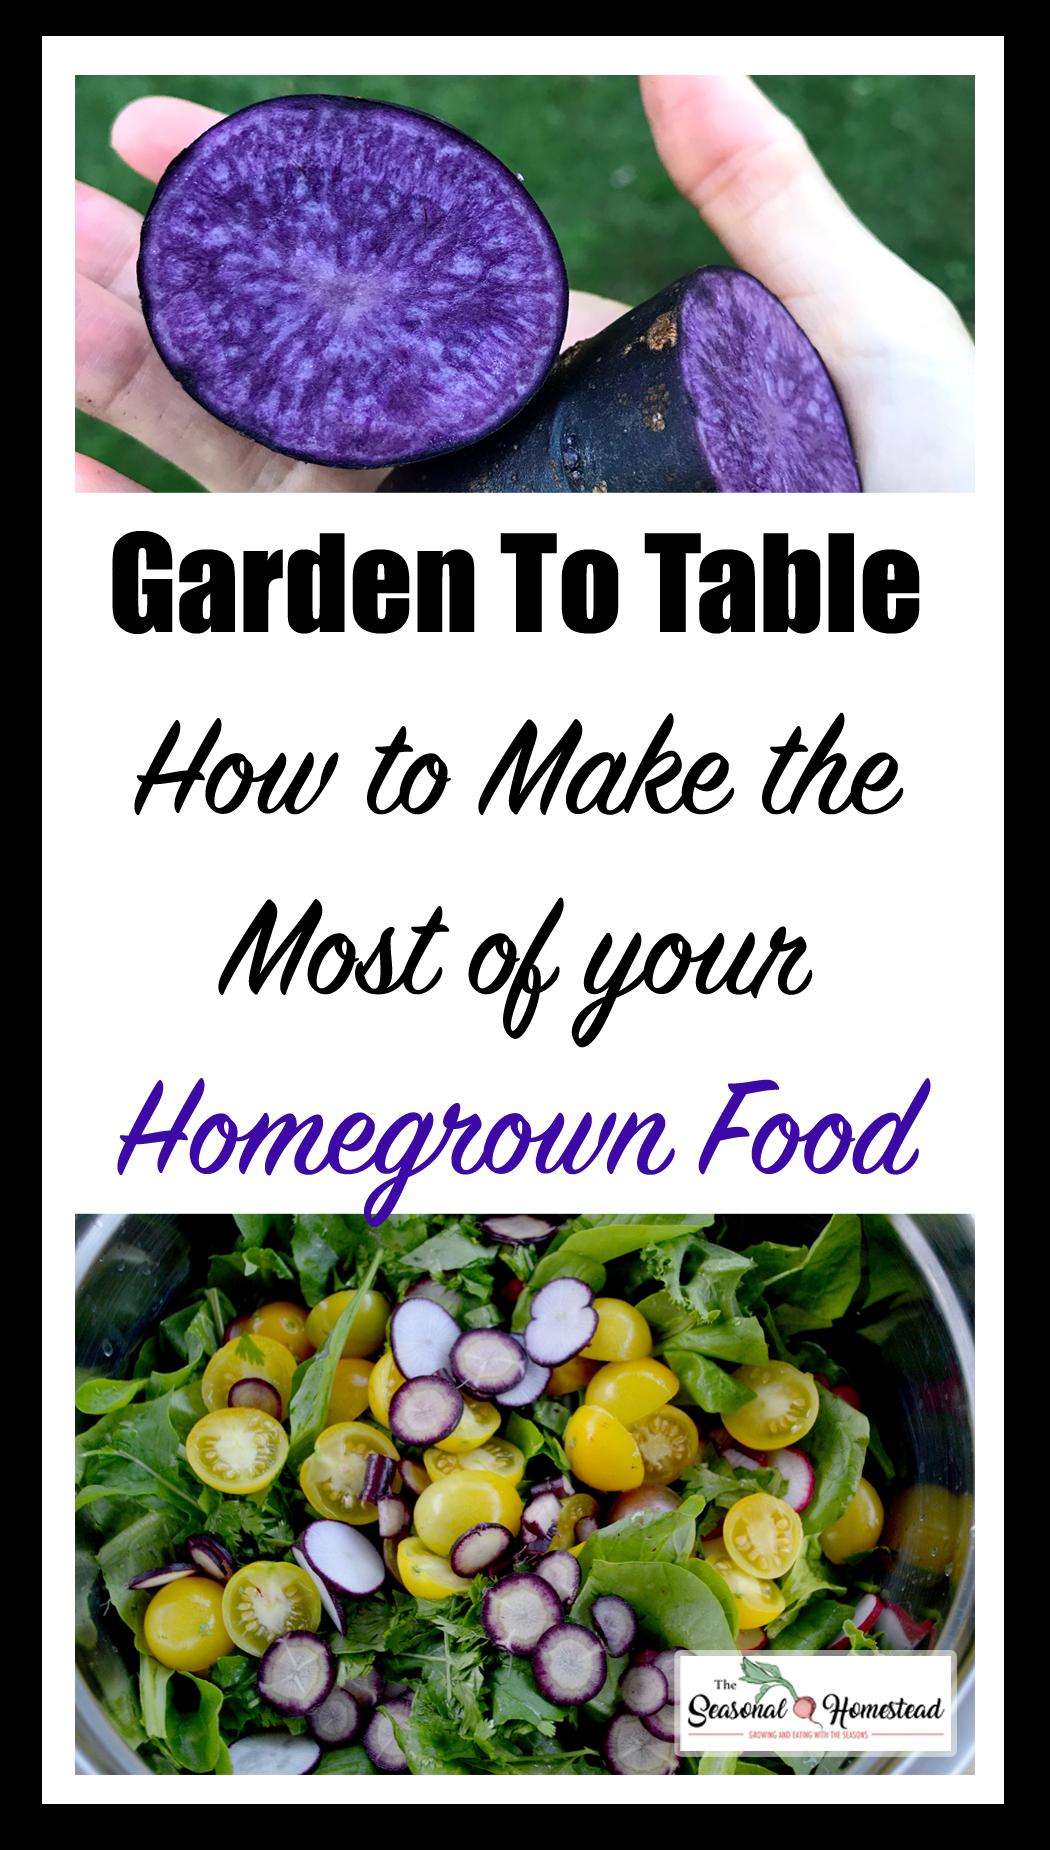 Gardentotable.png